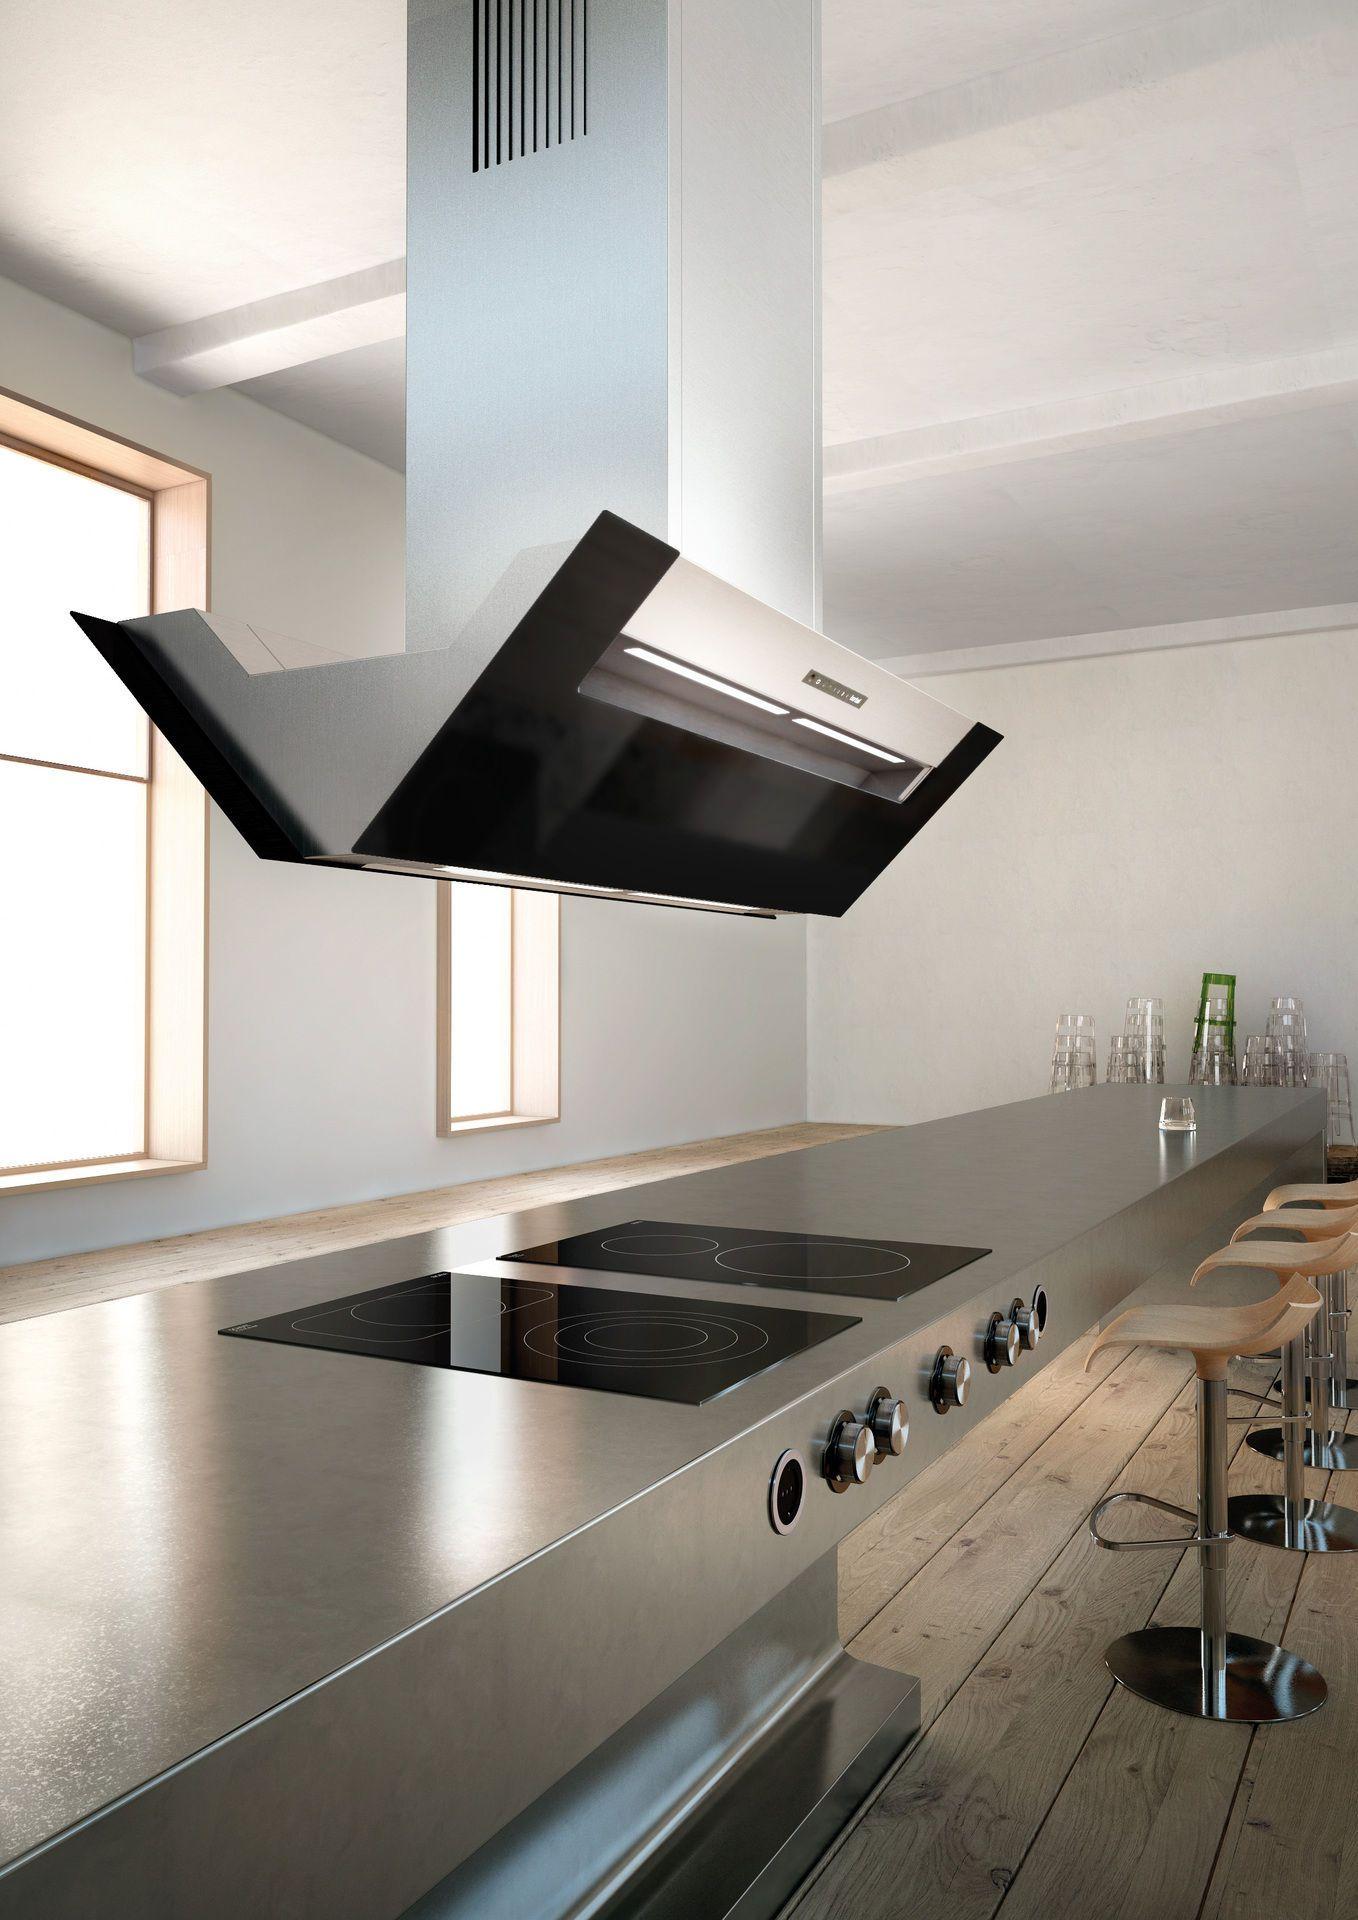 Full Size of Bosch Lüftung Küche Lüftung Küche Ohne Fenster Lüftung Küche Gastronomie Dichtheitsklasse Lüftung Küche Küche Lüftung Küche